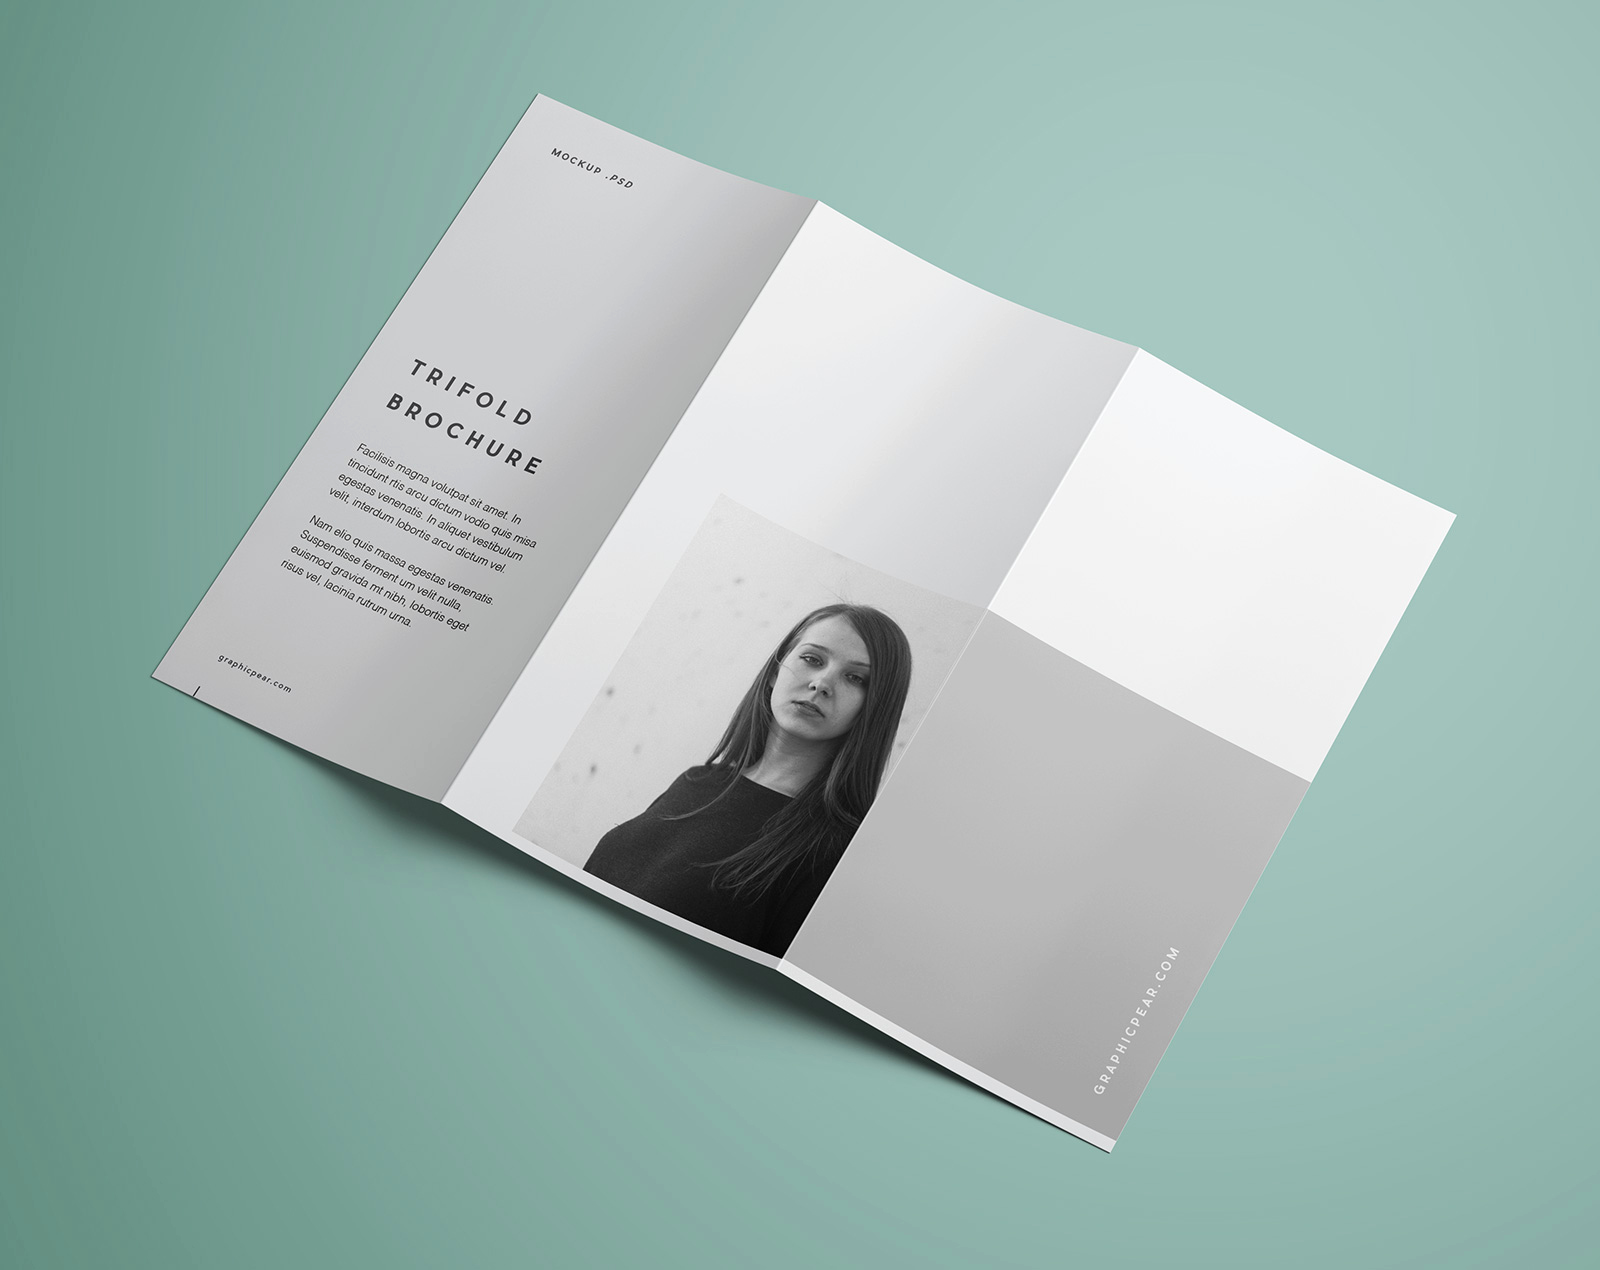 Tri Fold Brochure Template Psd Fresh Free Premium Tri Fold Brochure Mockup Psd Good Mockups